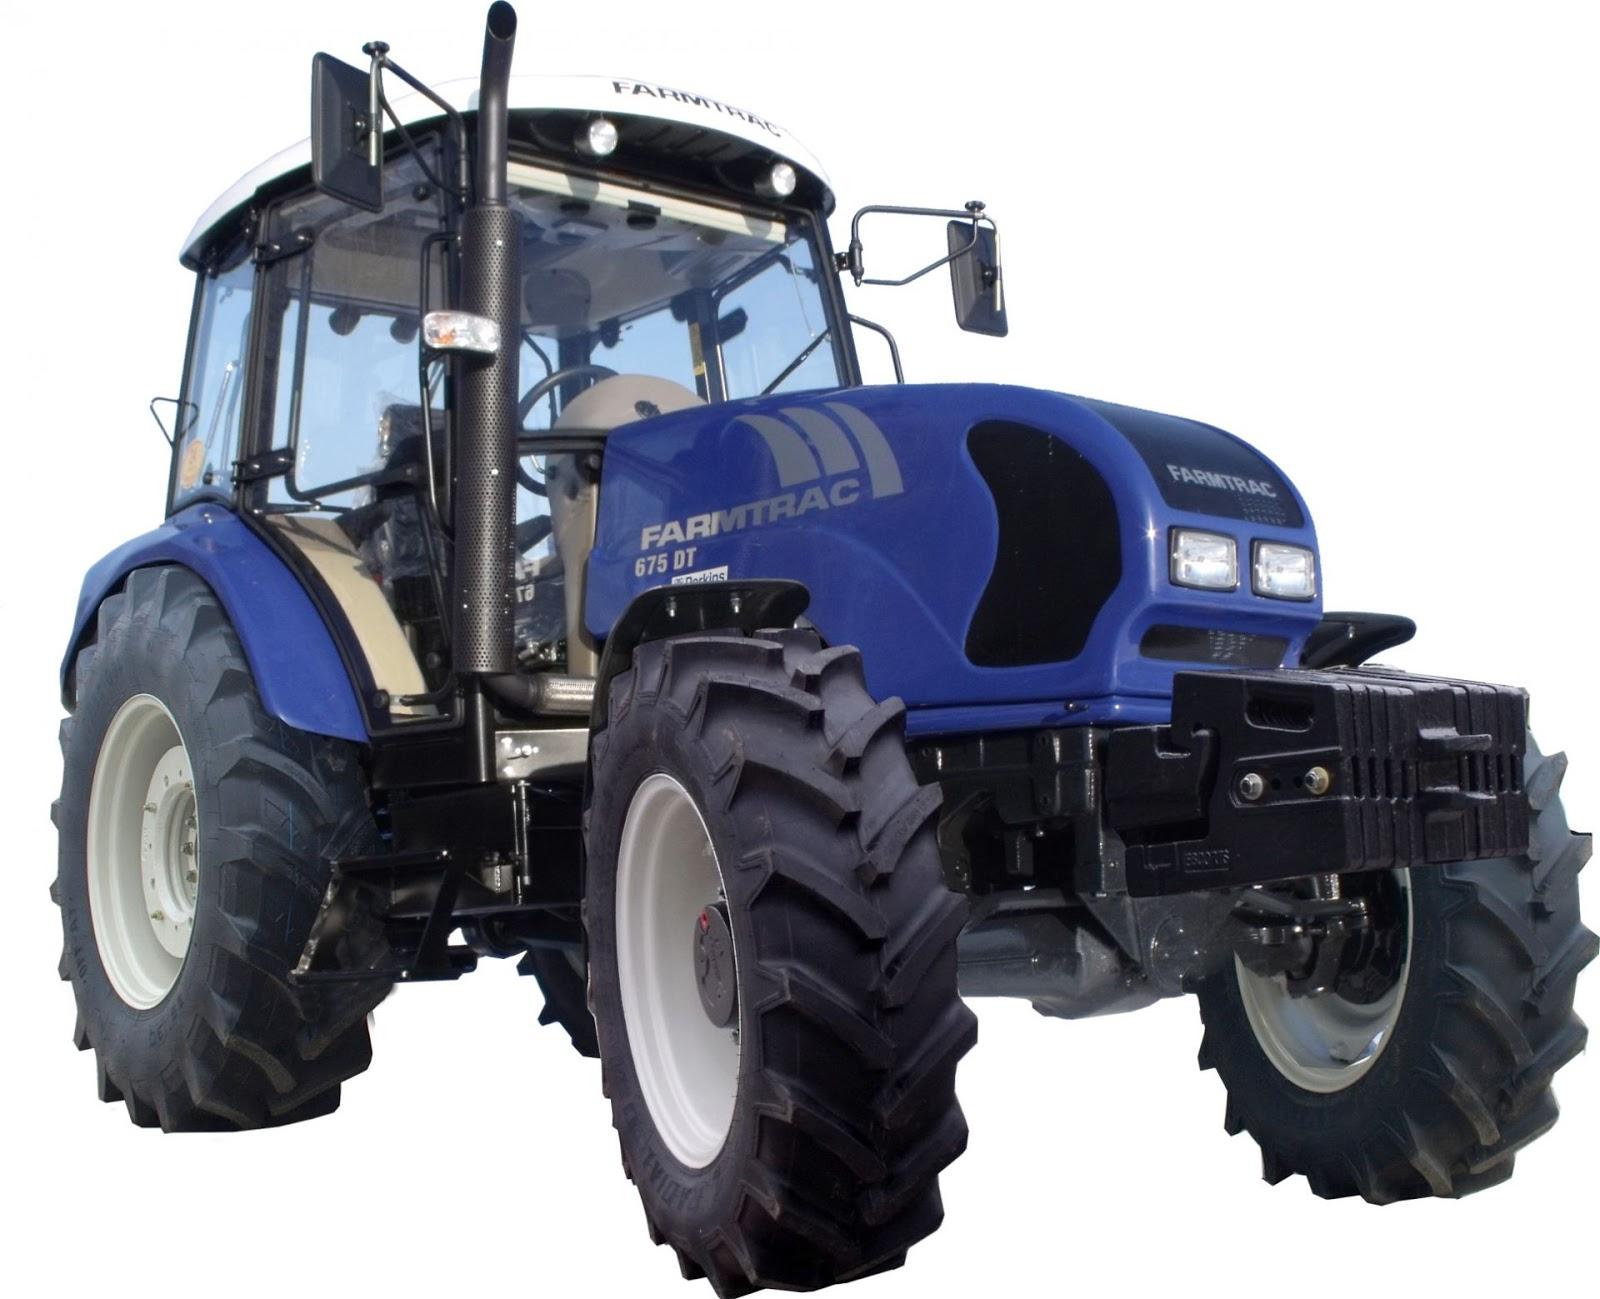 Farmtrac 320